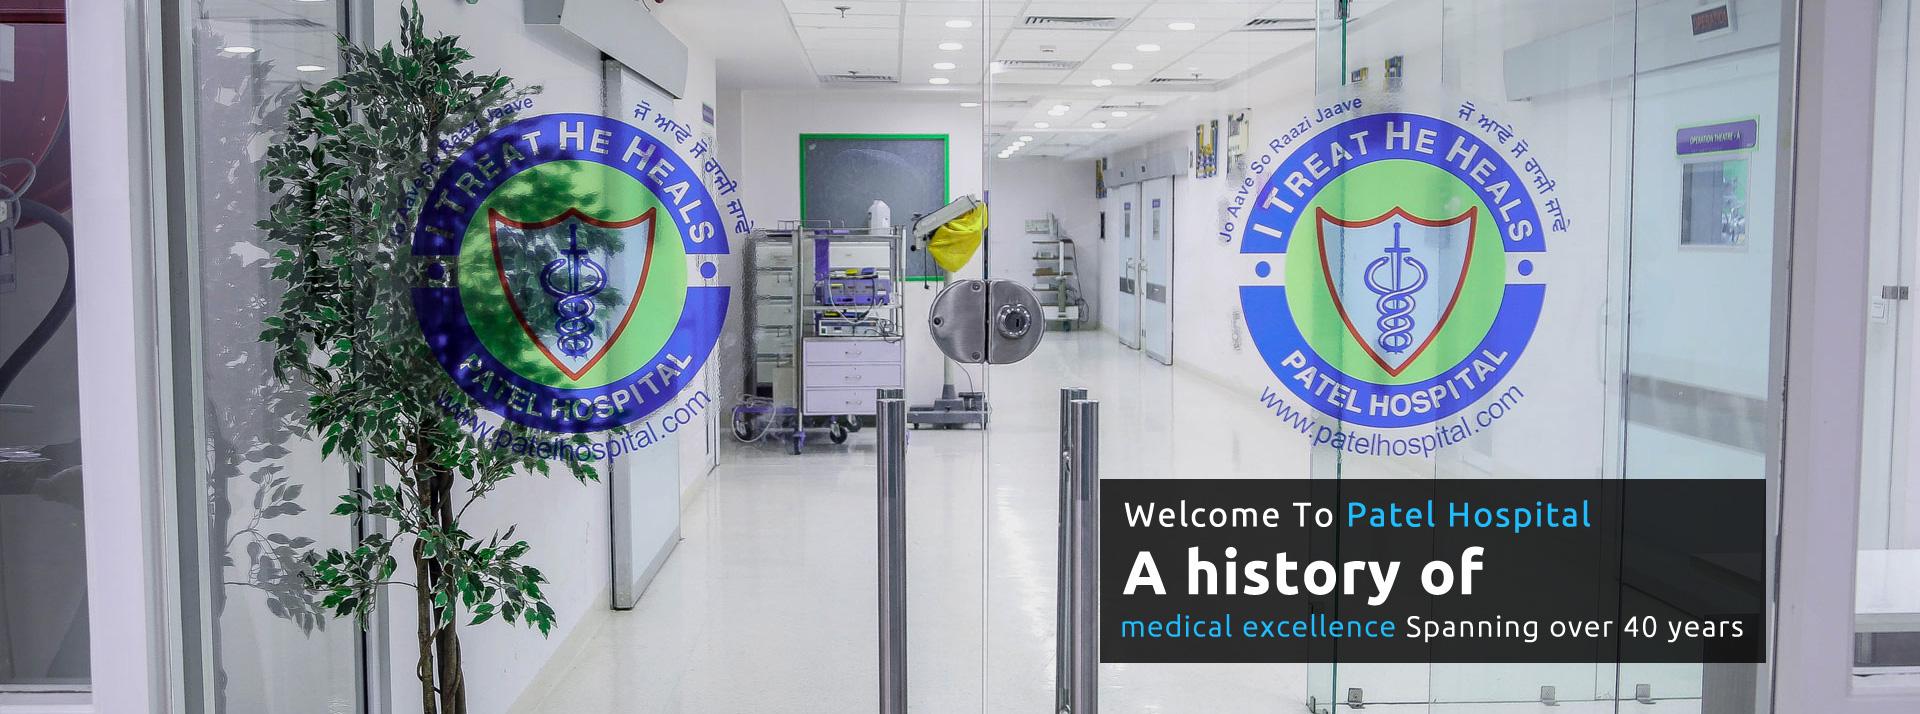 Patel Hospital Super Speciality Care